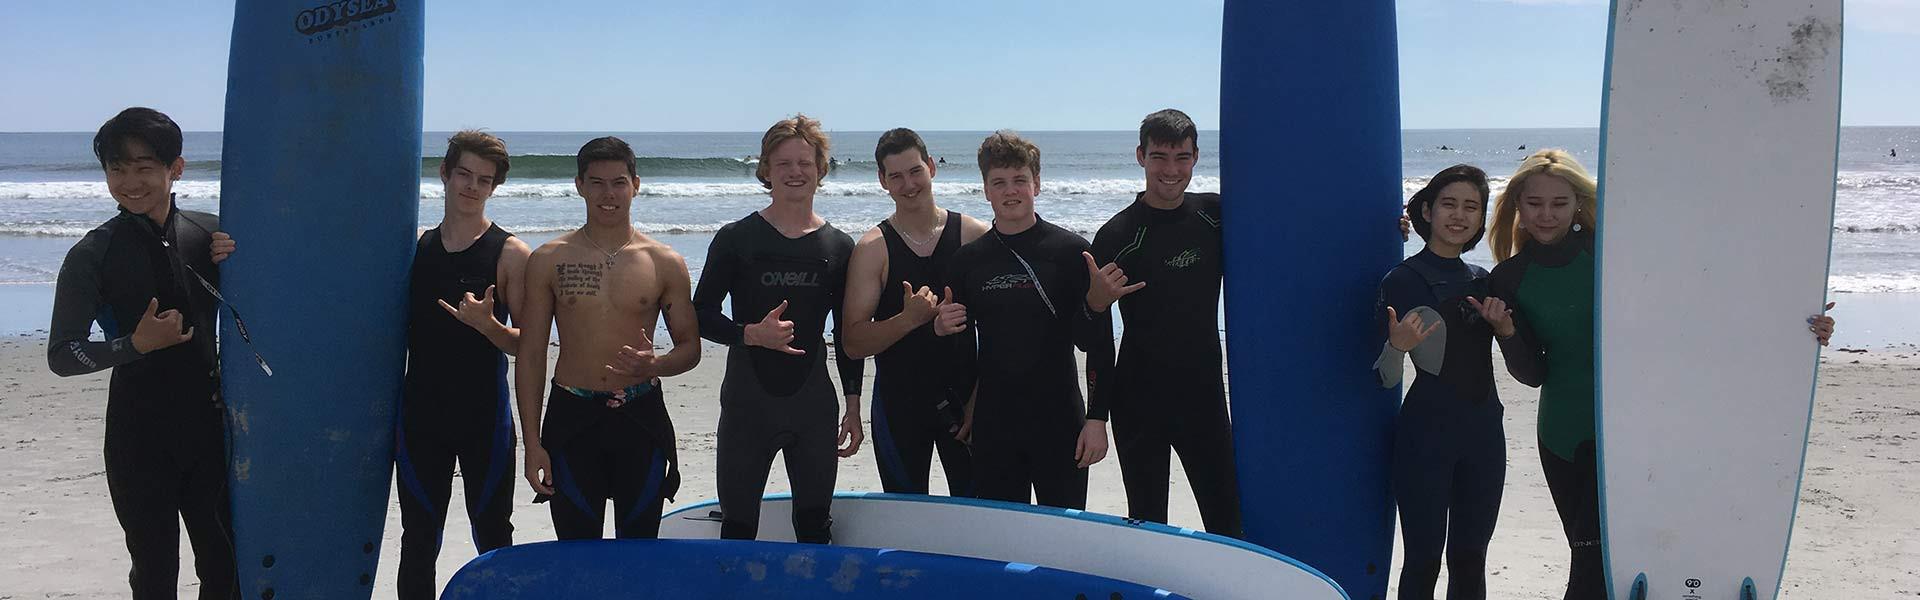 Students Surfing Hebron Academy Maine